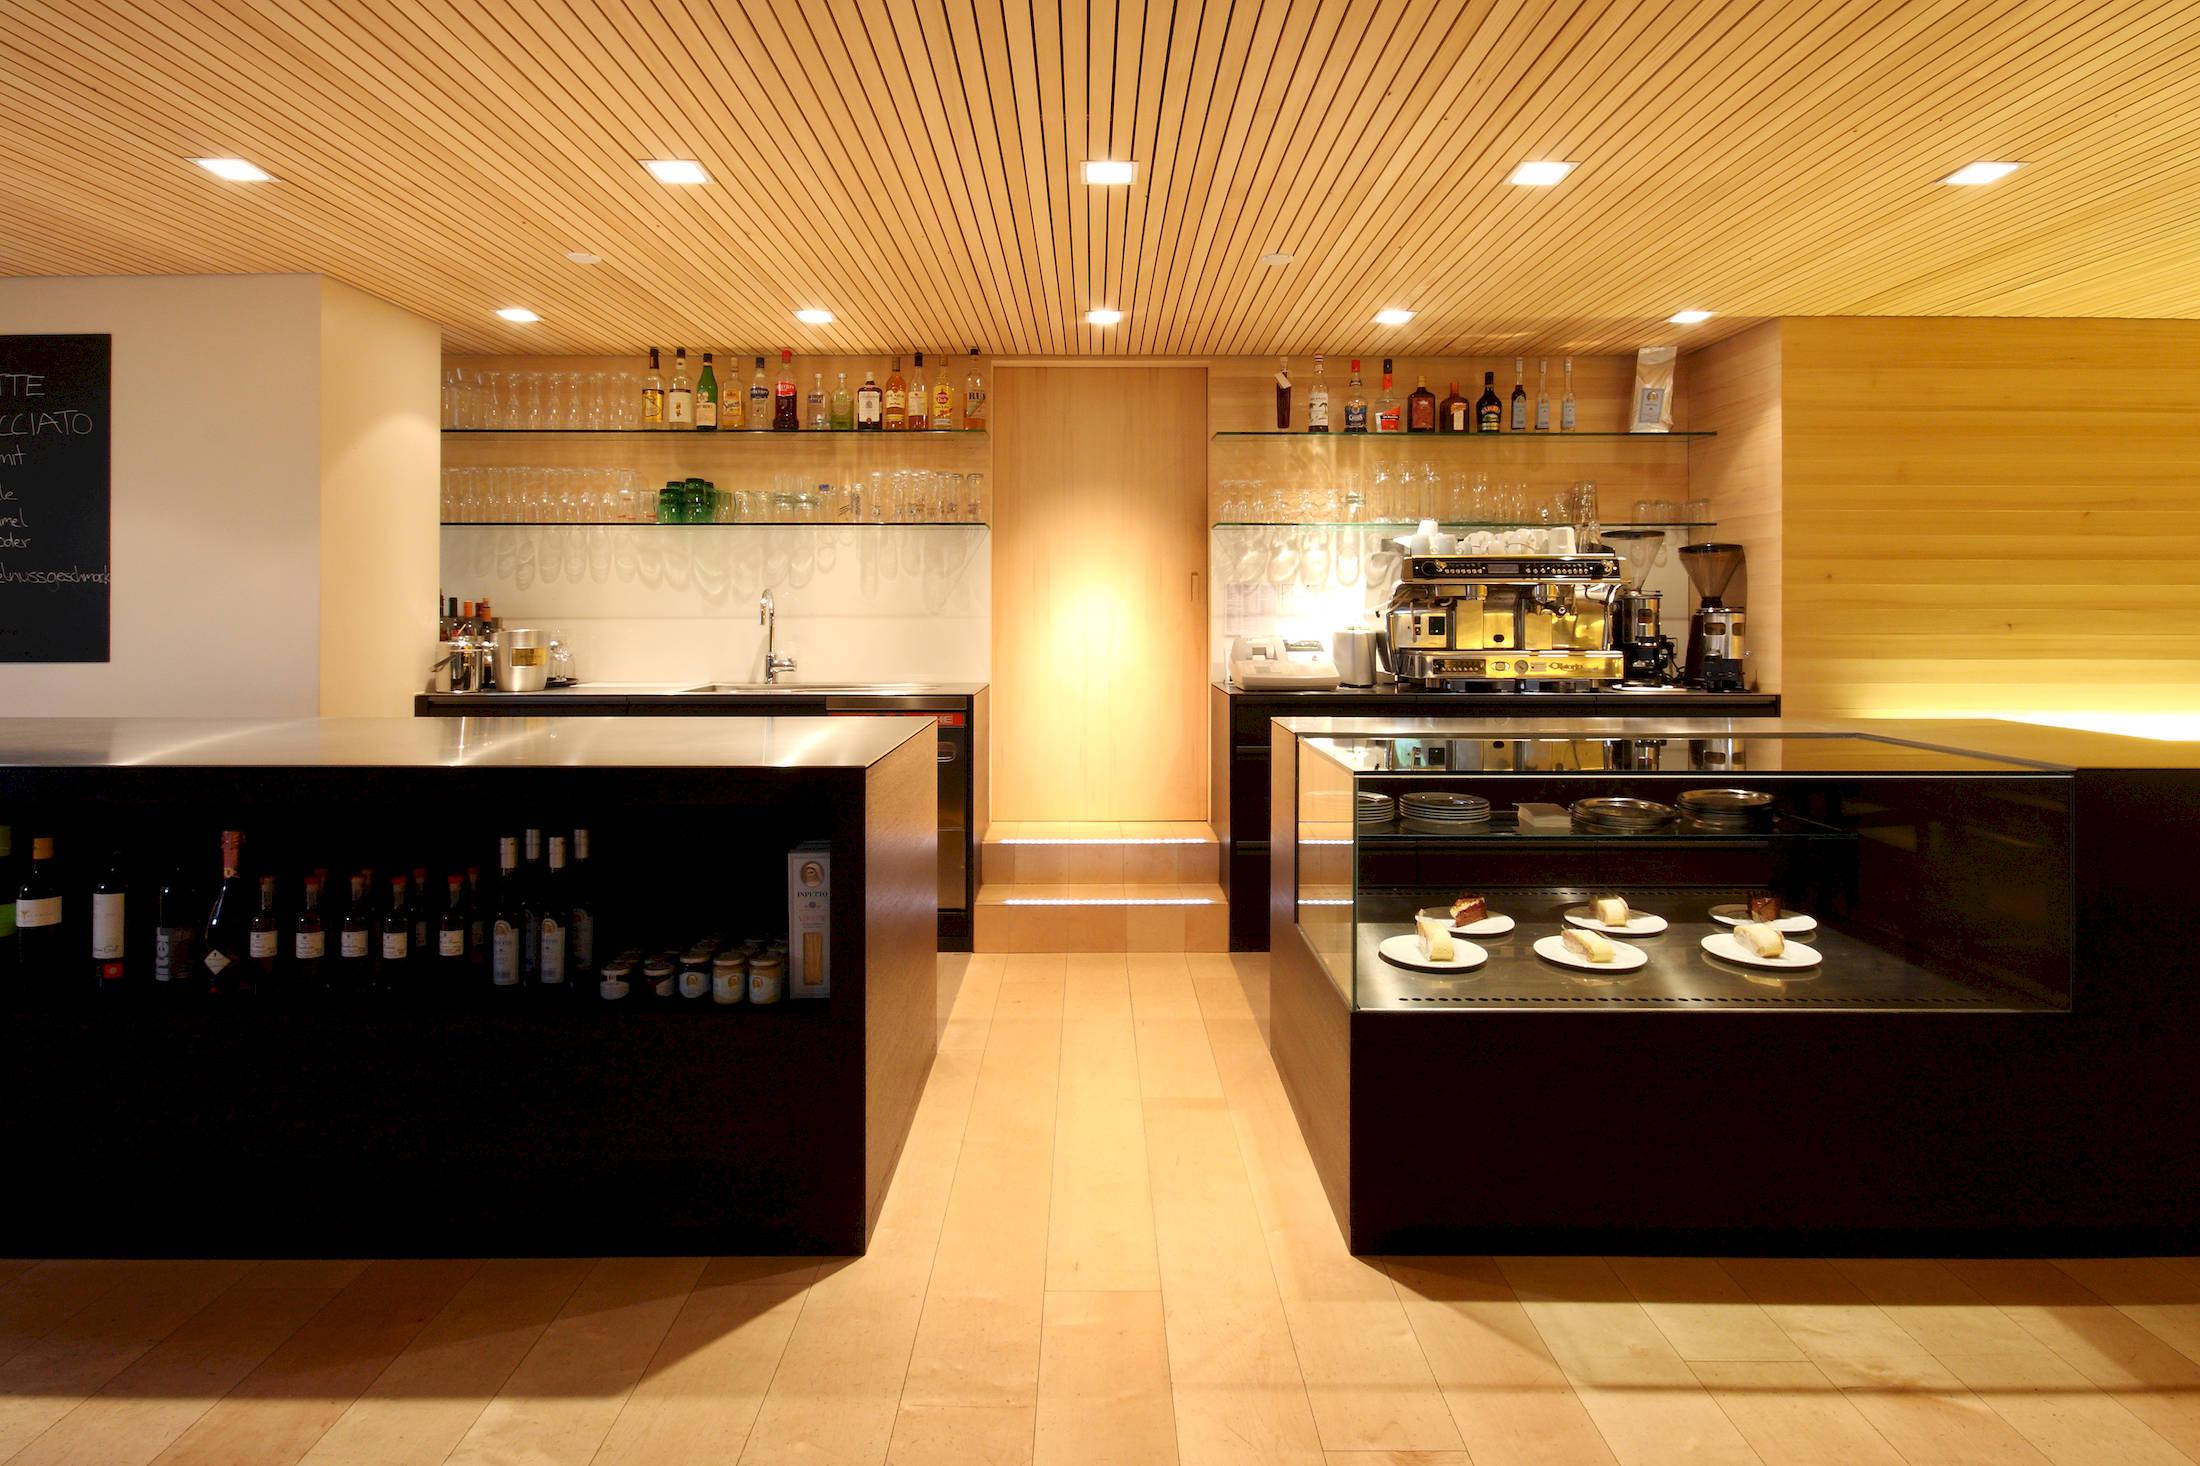 cafe angelikah he schwarzenberg kaufmann zimmerei tischlerei holzmodulbau. Black Bedroom Furniture Sets. Home Design Ideas